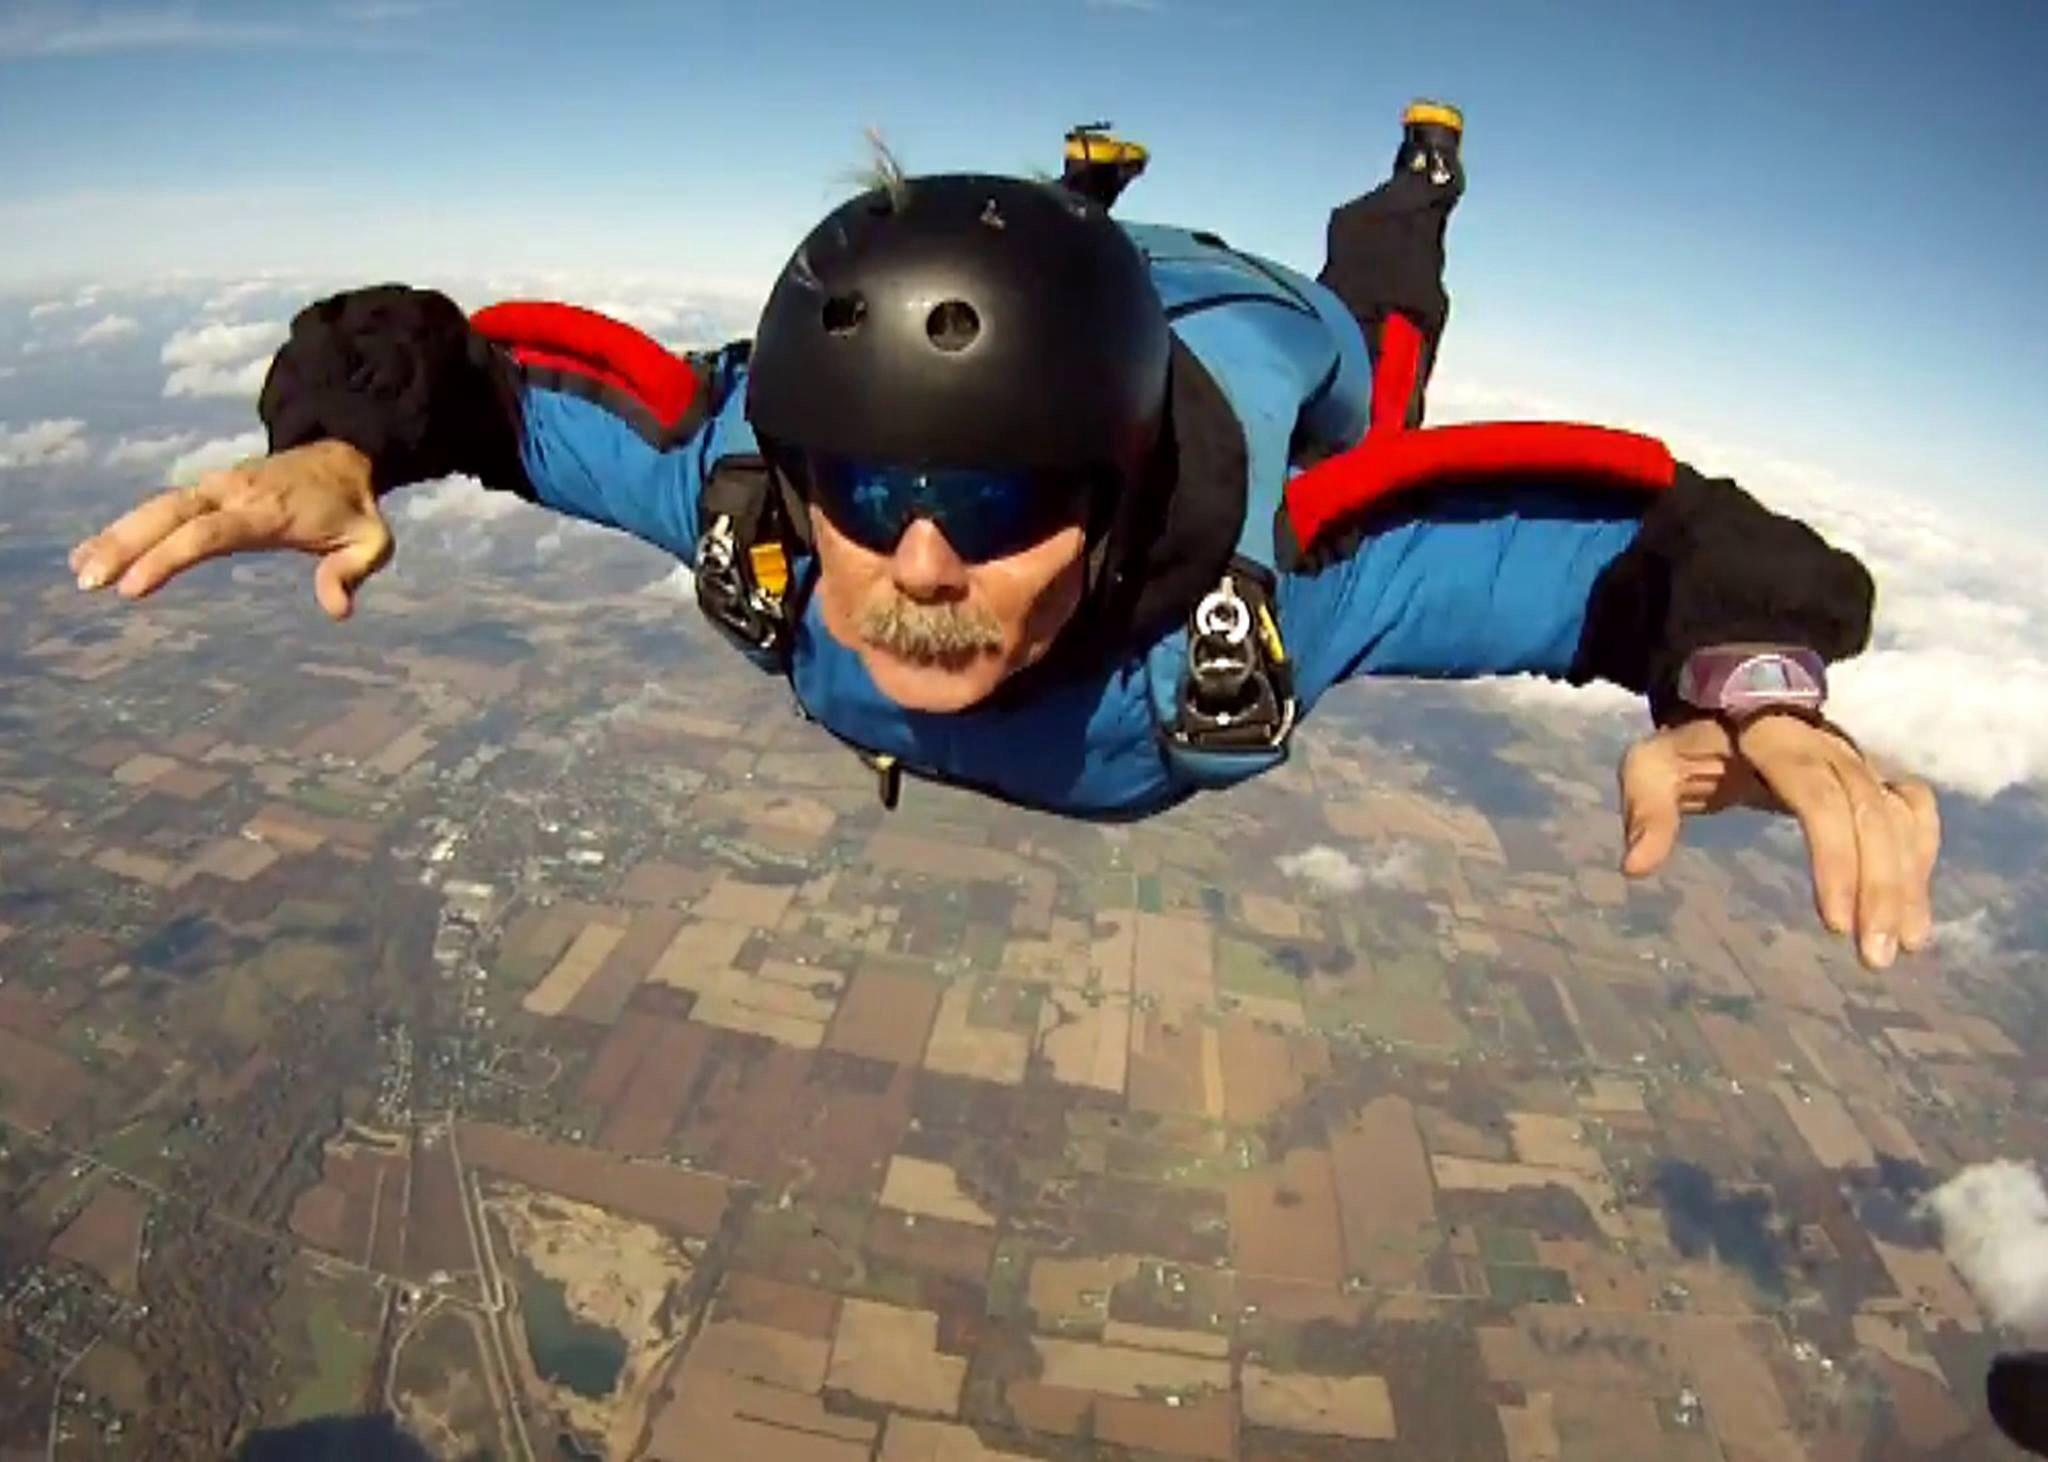 Skydive Tecumseh - Michigan - Dropzone com